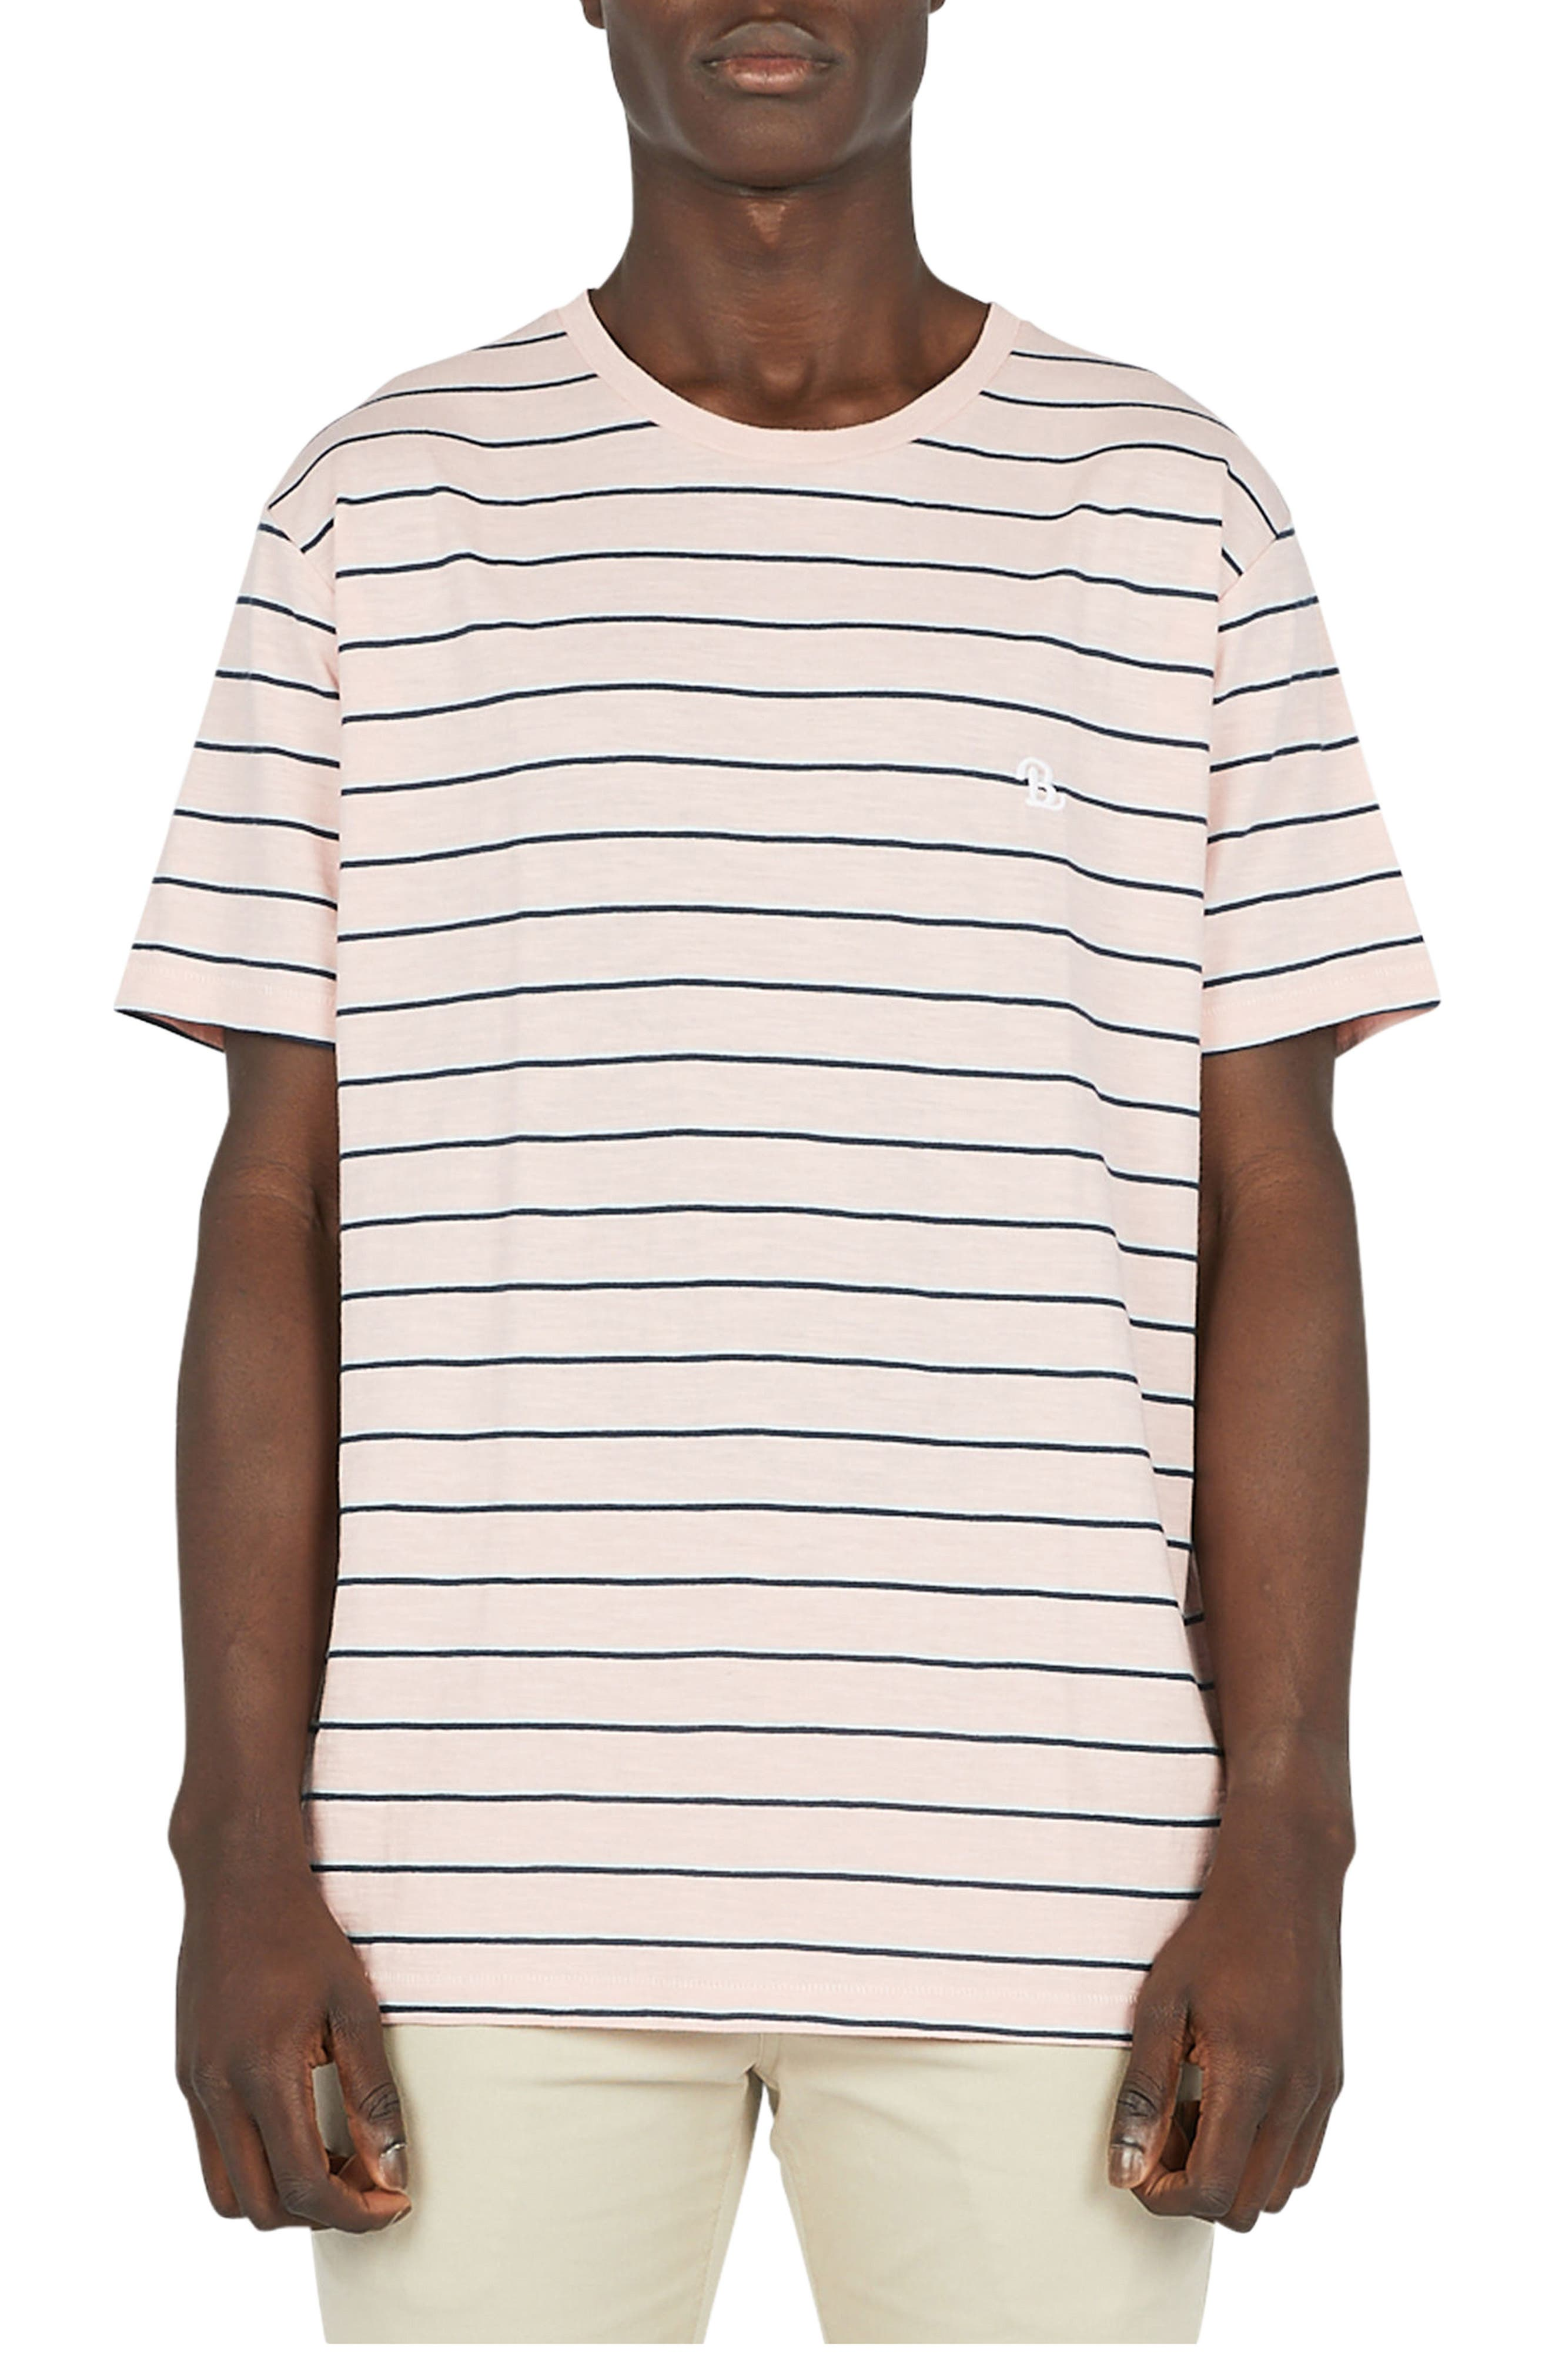 B.Schooled T-Shirt,                             Main thumbnail 1, color,                             Pink Stripe